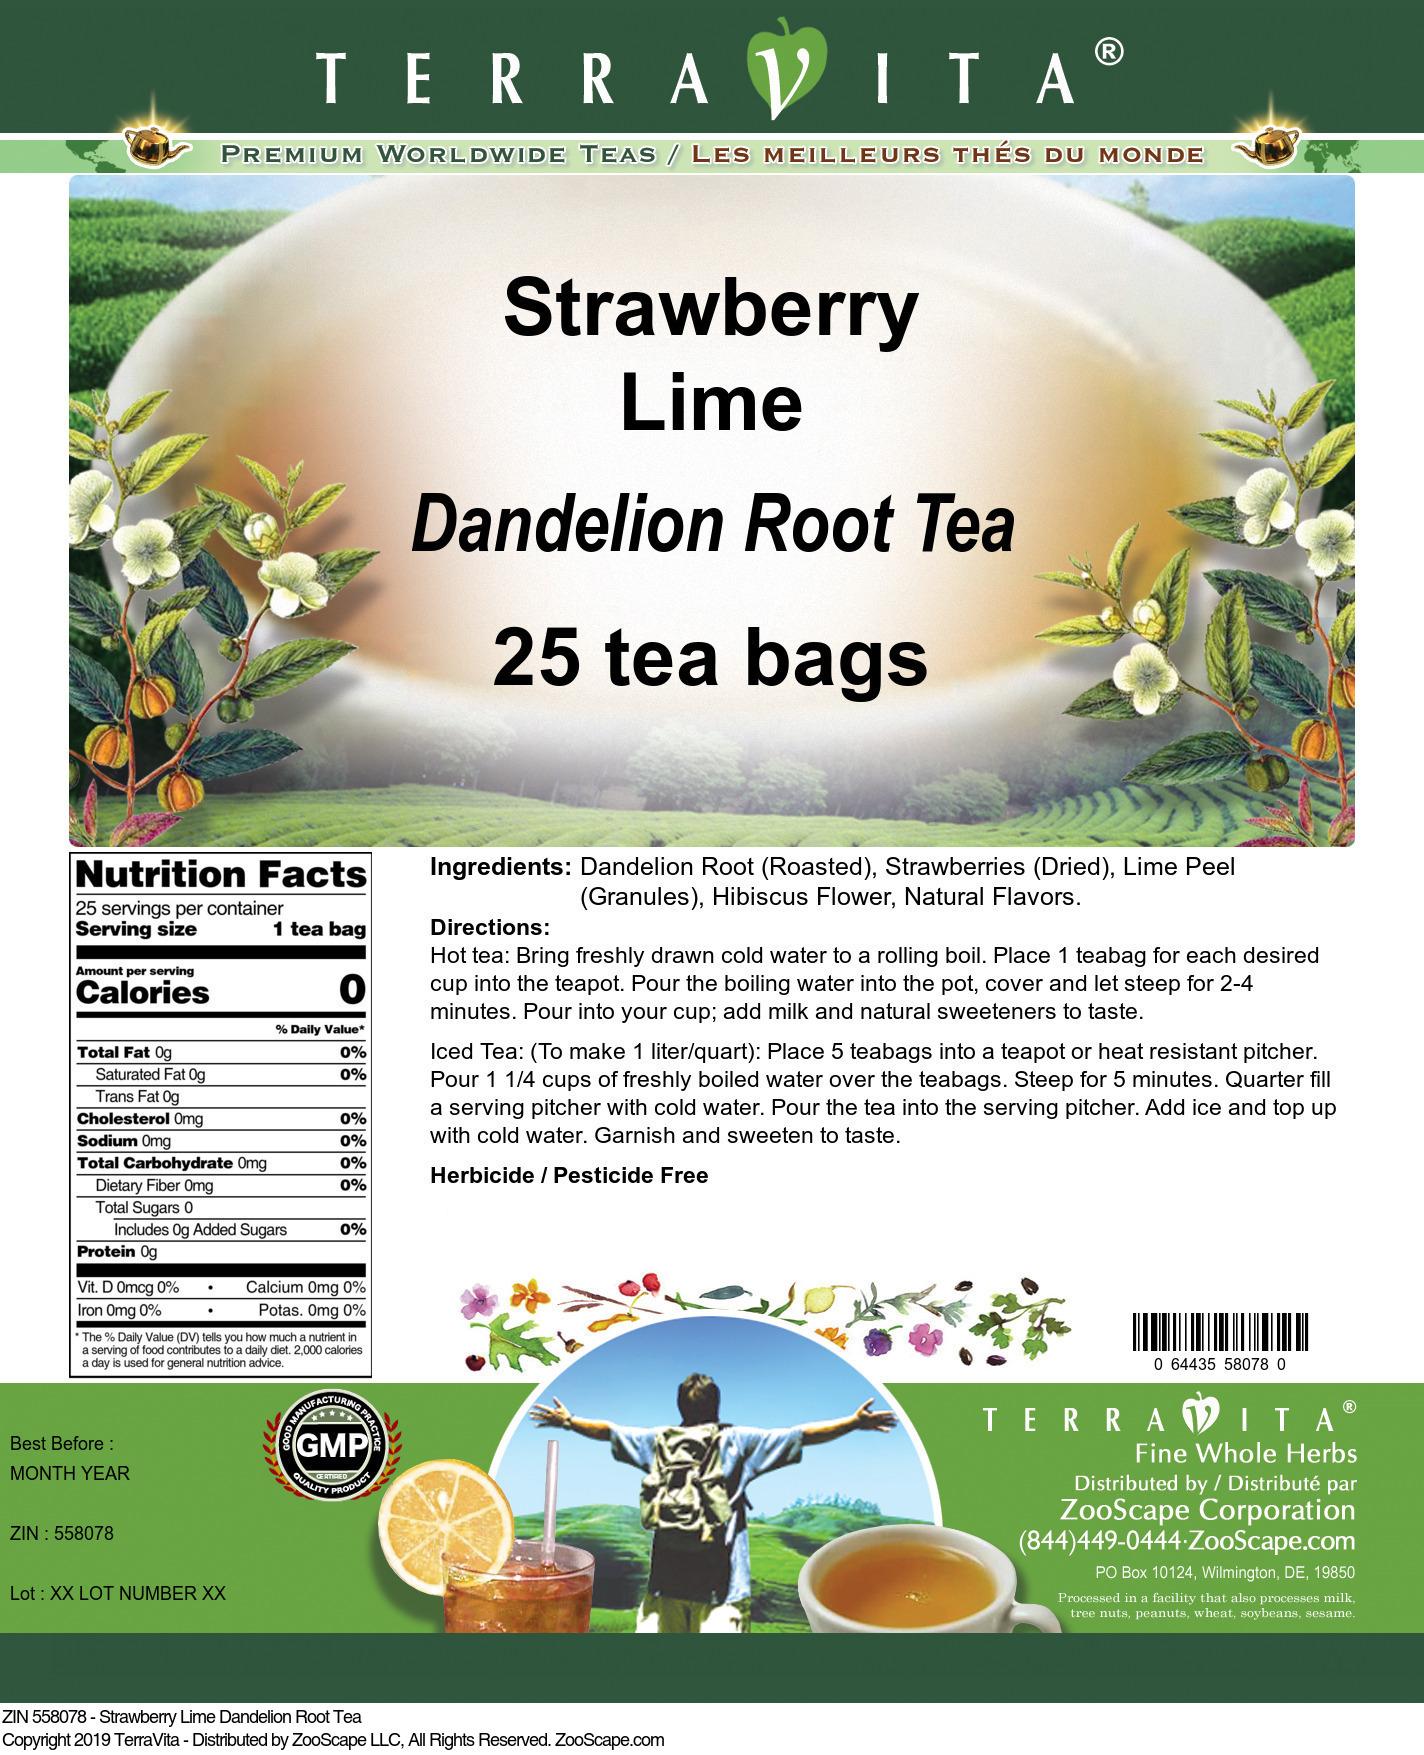 Strawberry Lime Dandelion Root Tea